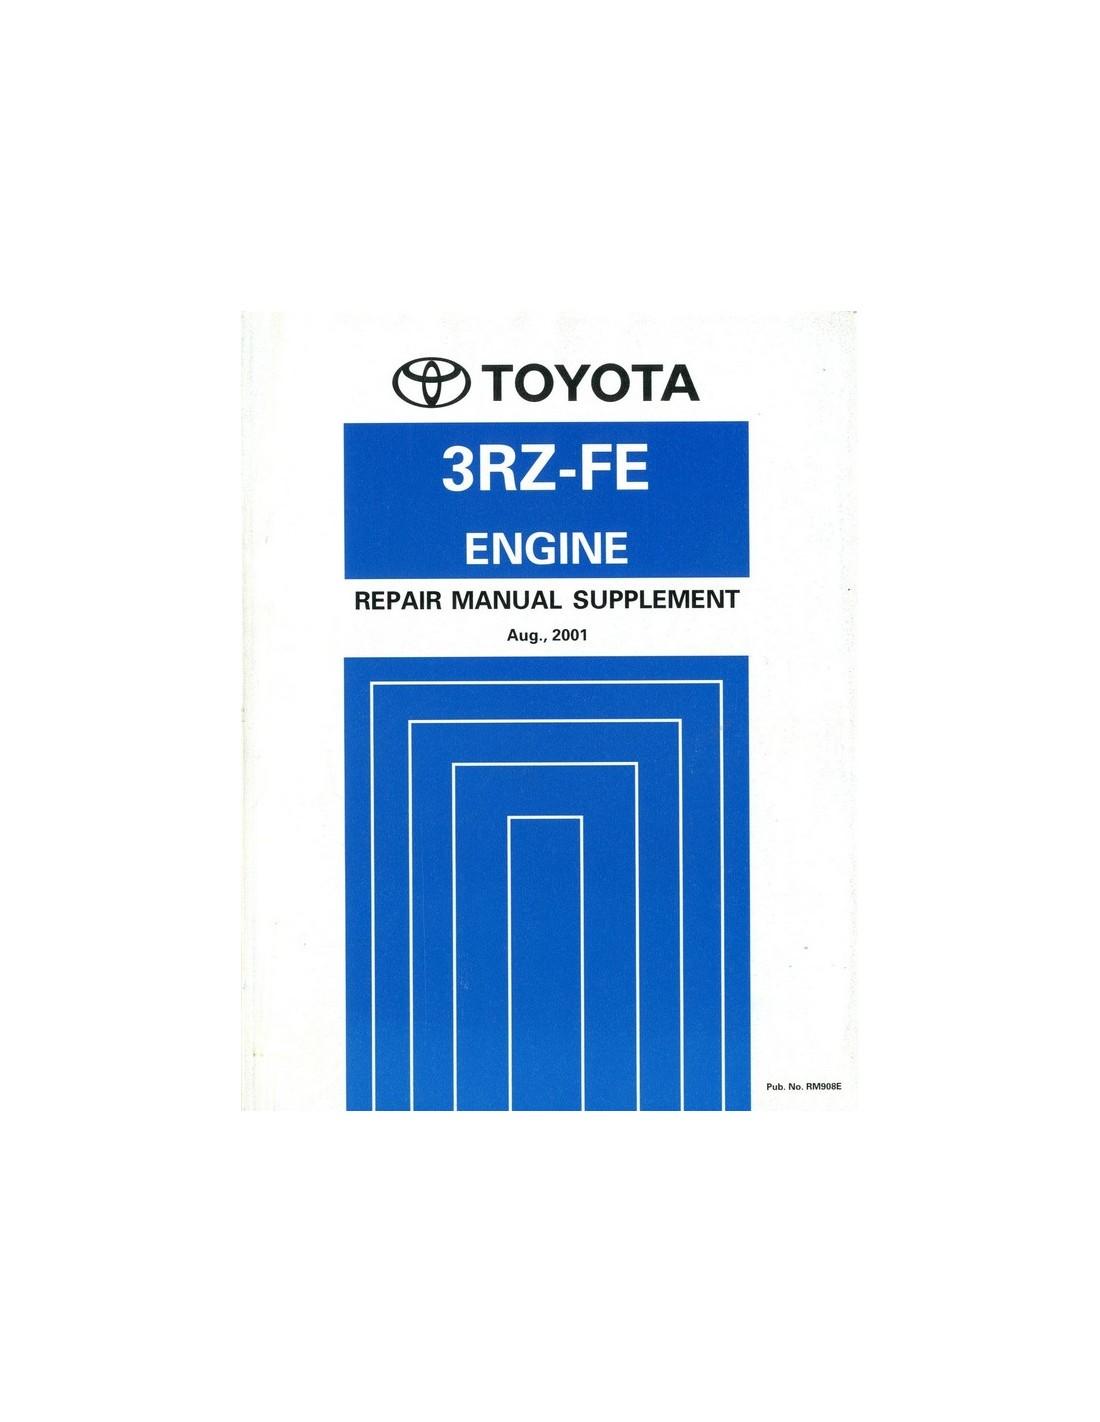 2001 toyota hilux hiace 3rz fe engine repair manual english rh autolit eu Car Repair Manuals Toyota Parts